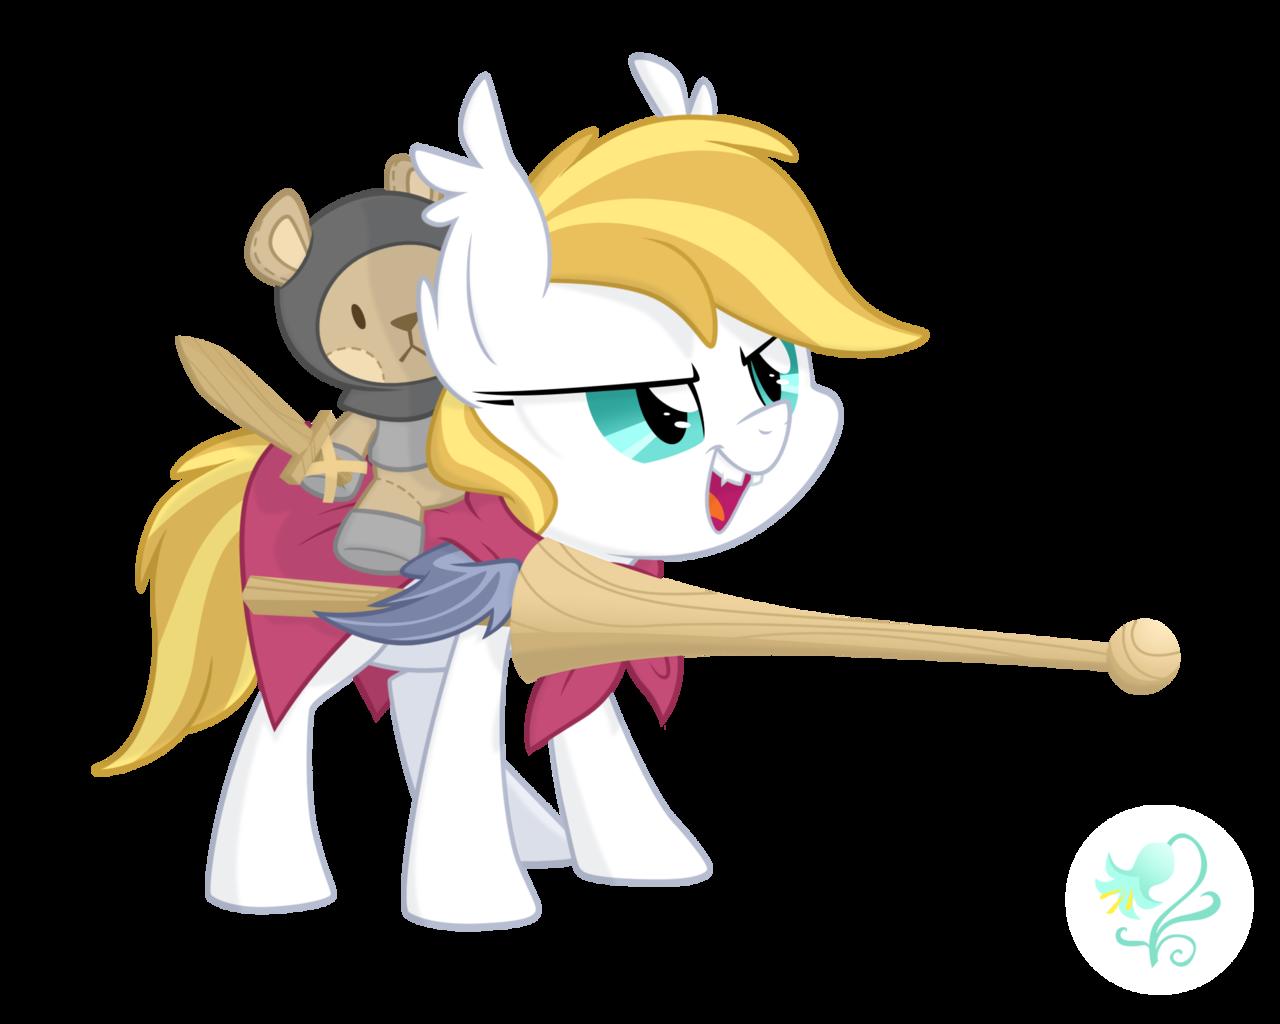 ThePonyArtCollection: Adorable OC Pony